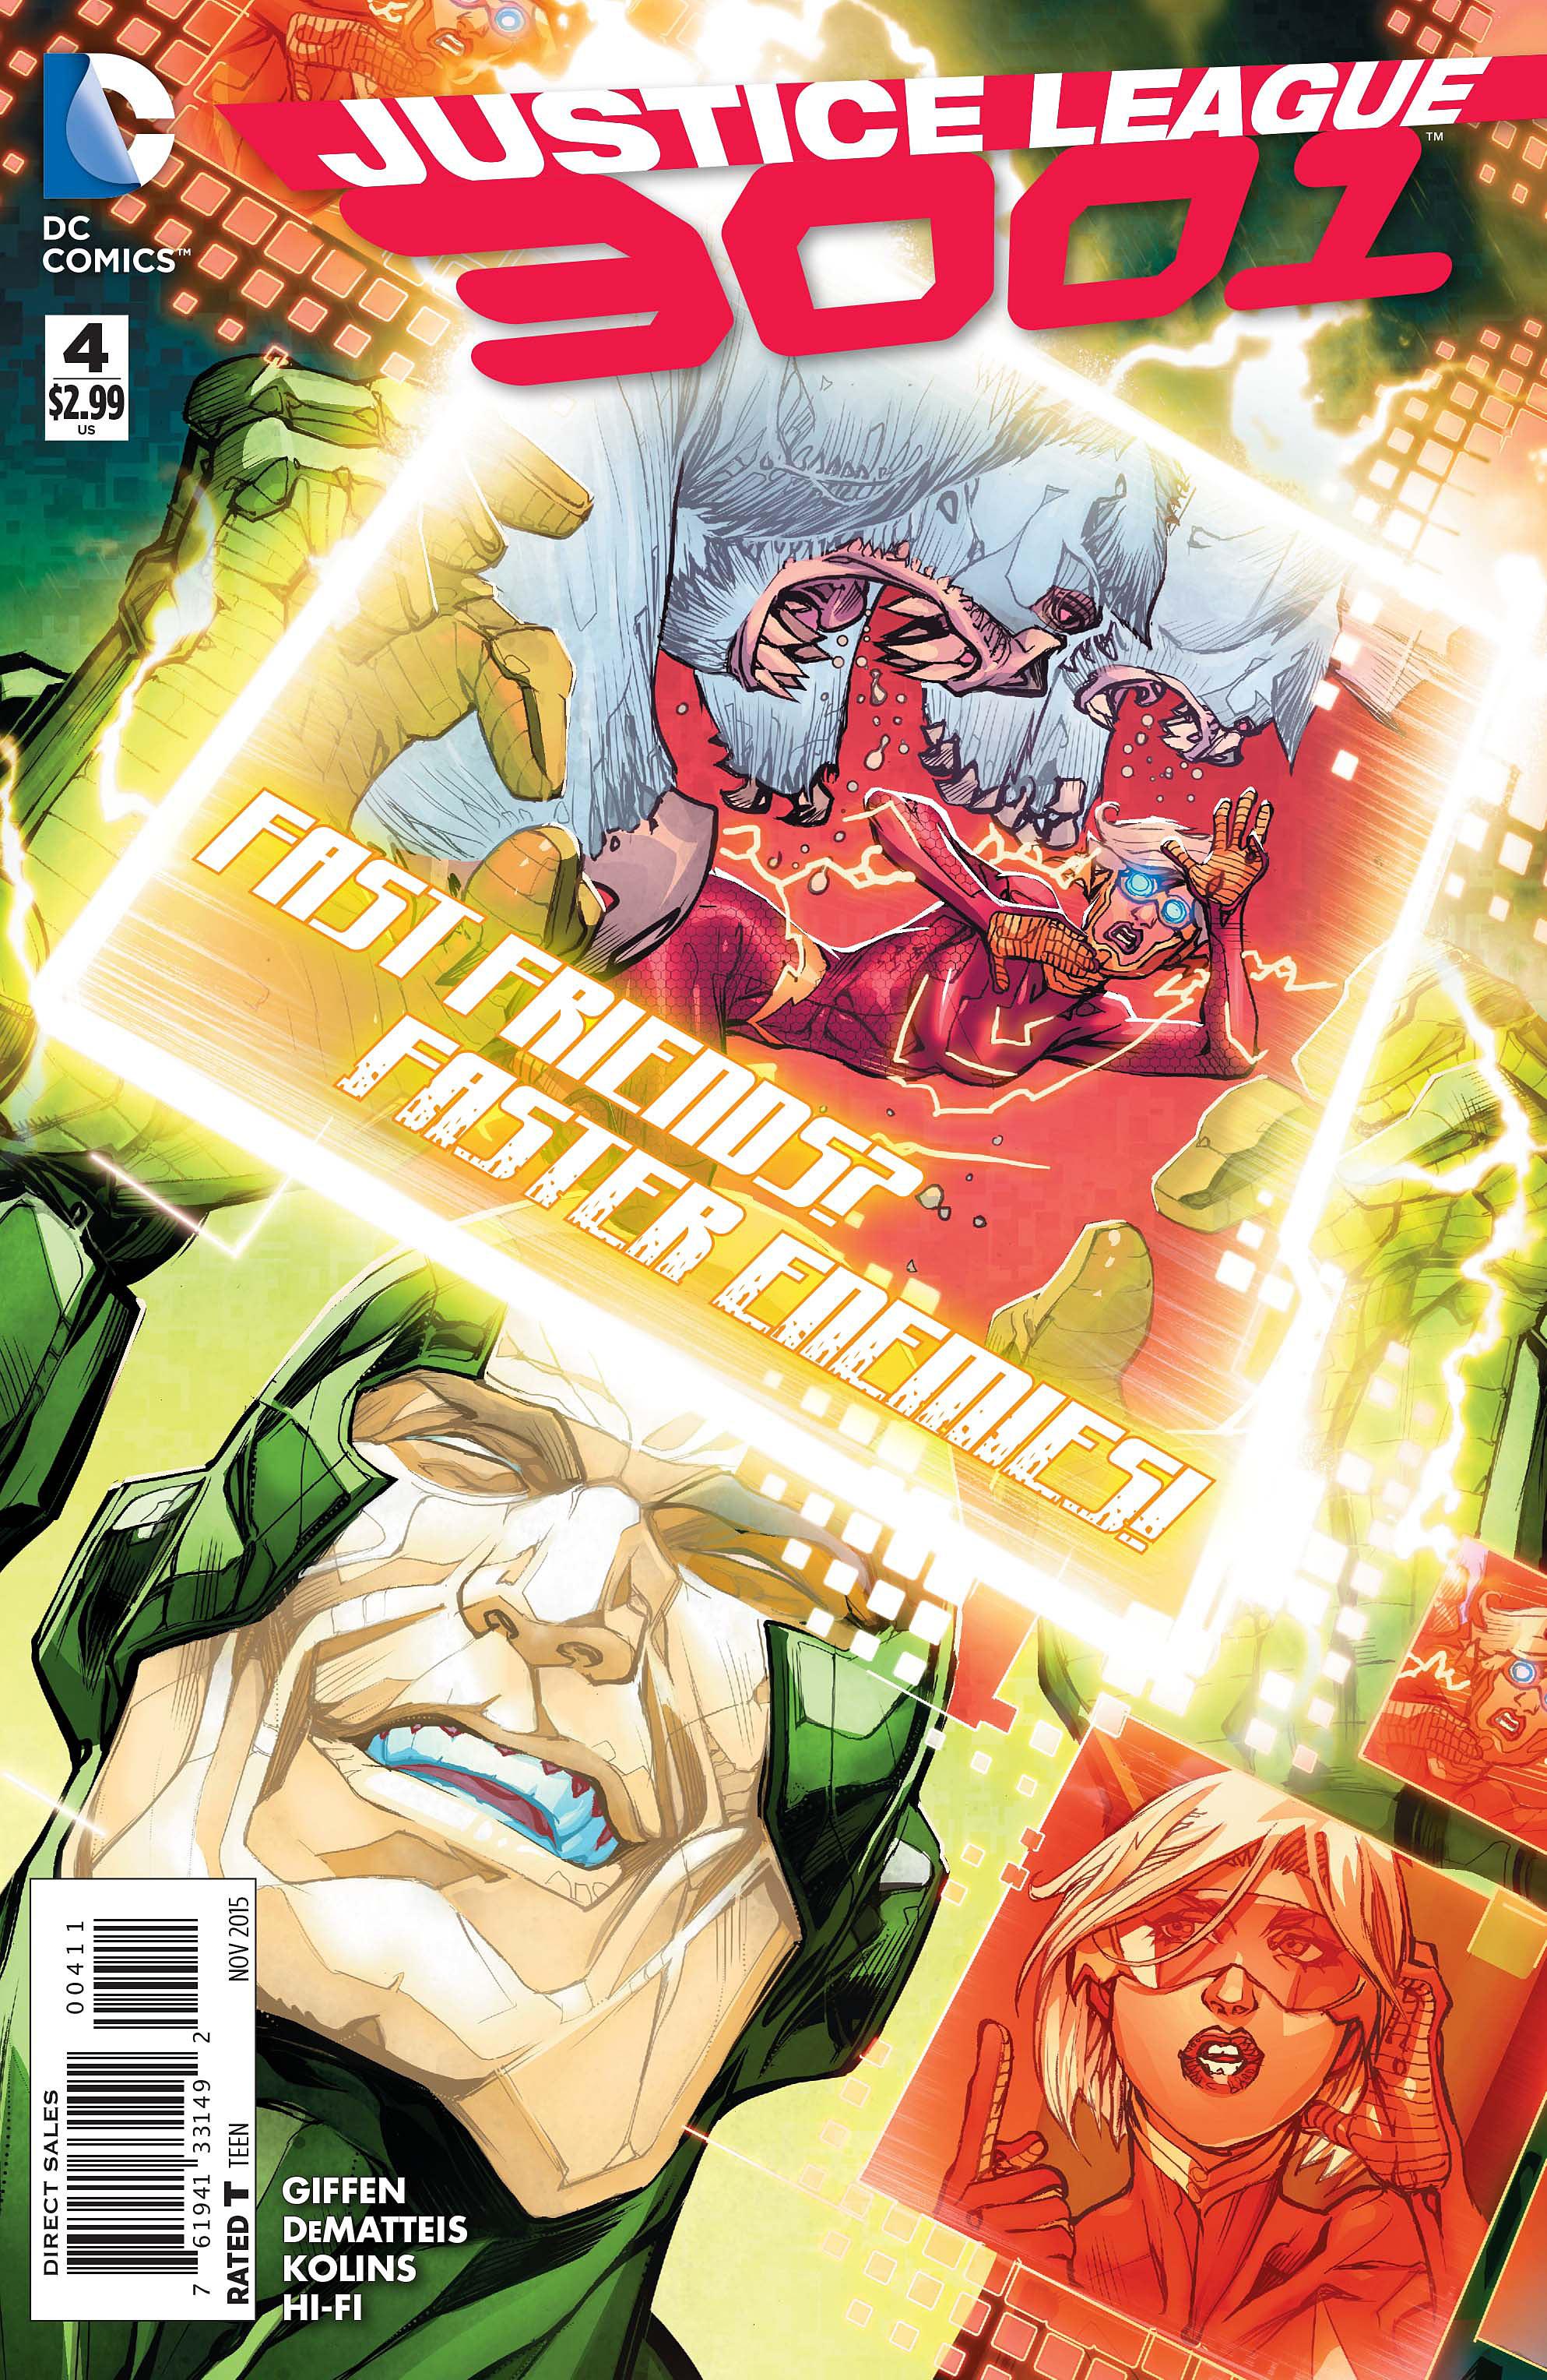 Justice League 3001 Vol 1 4